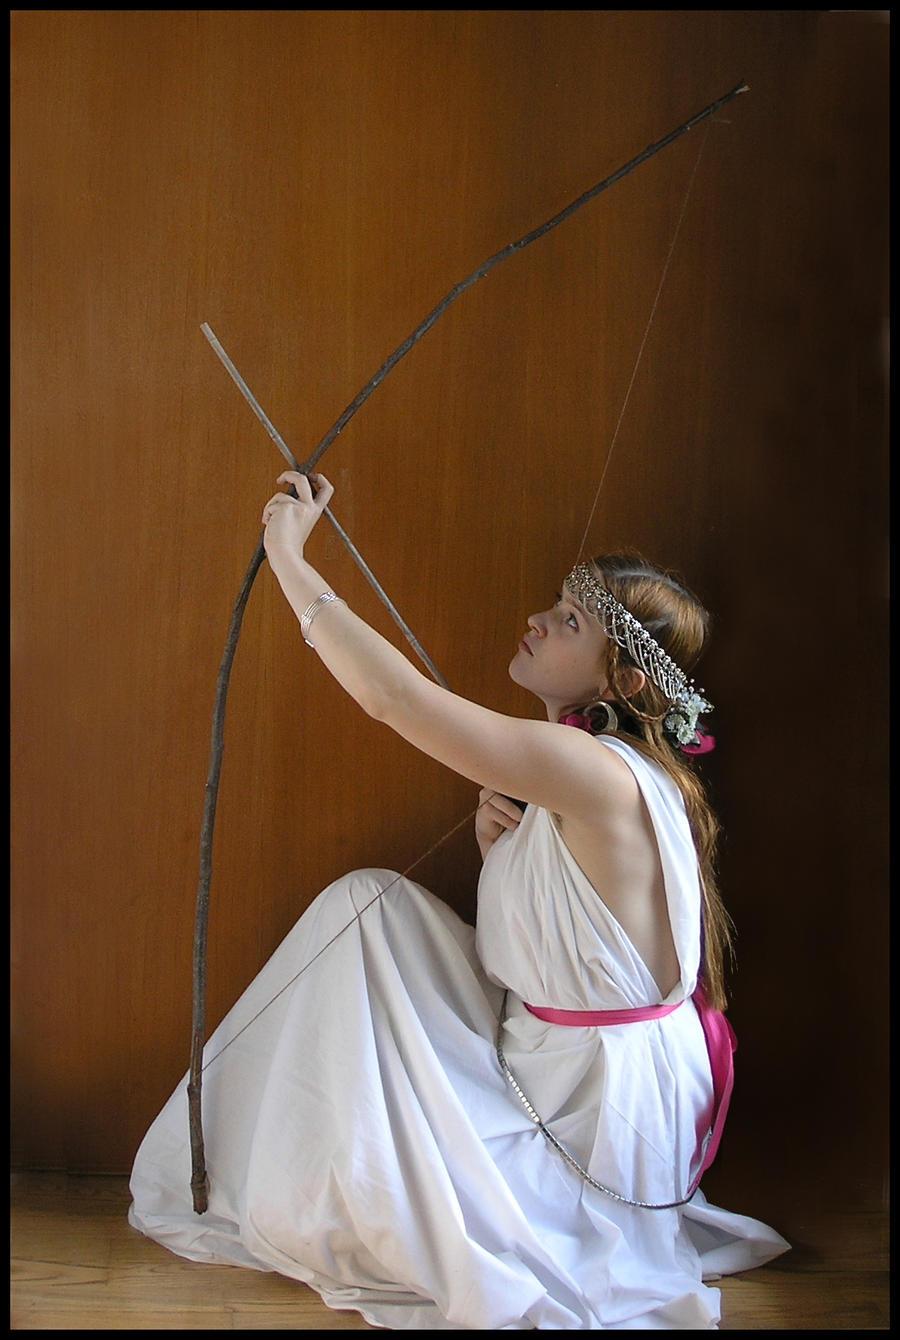 Artemis I